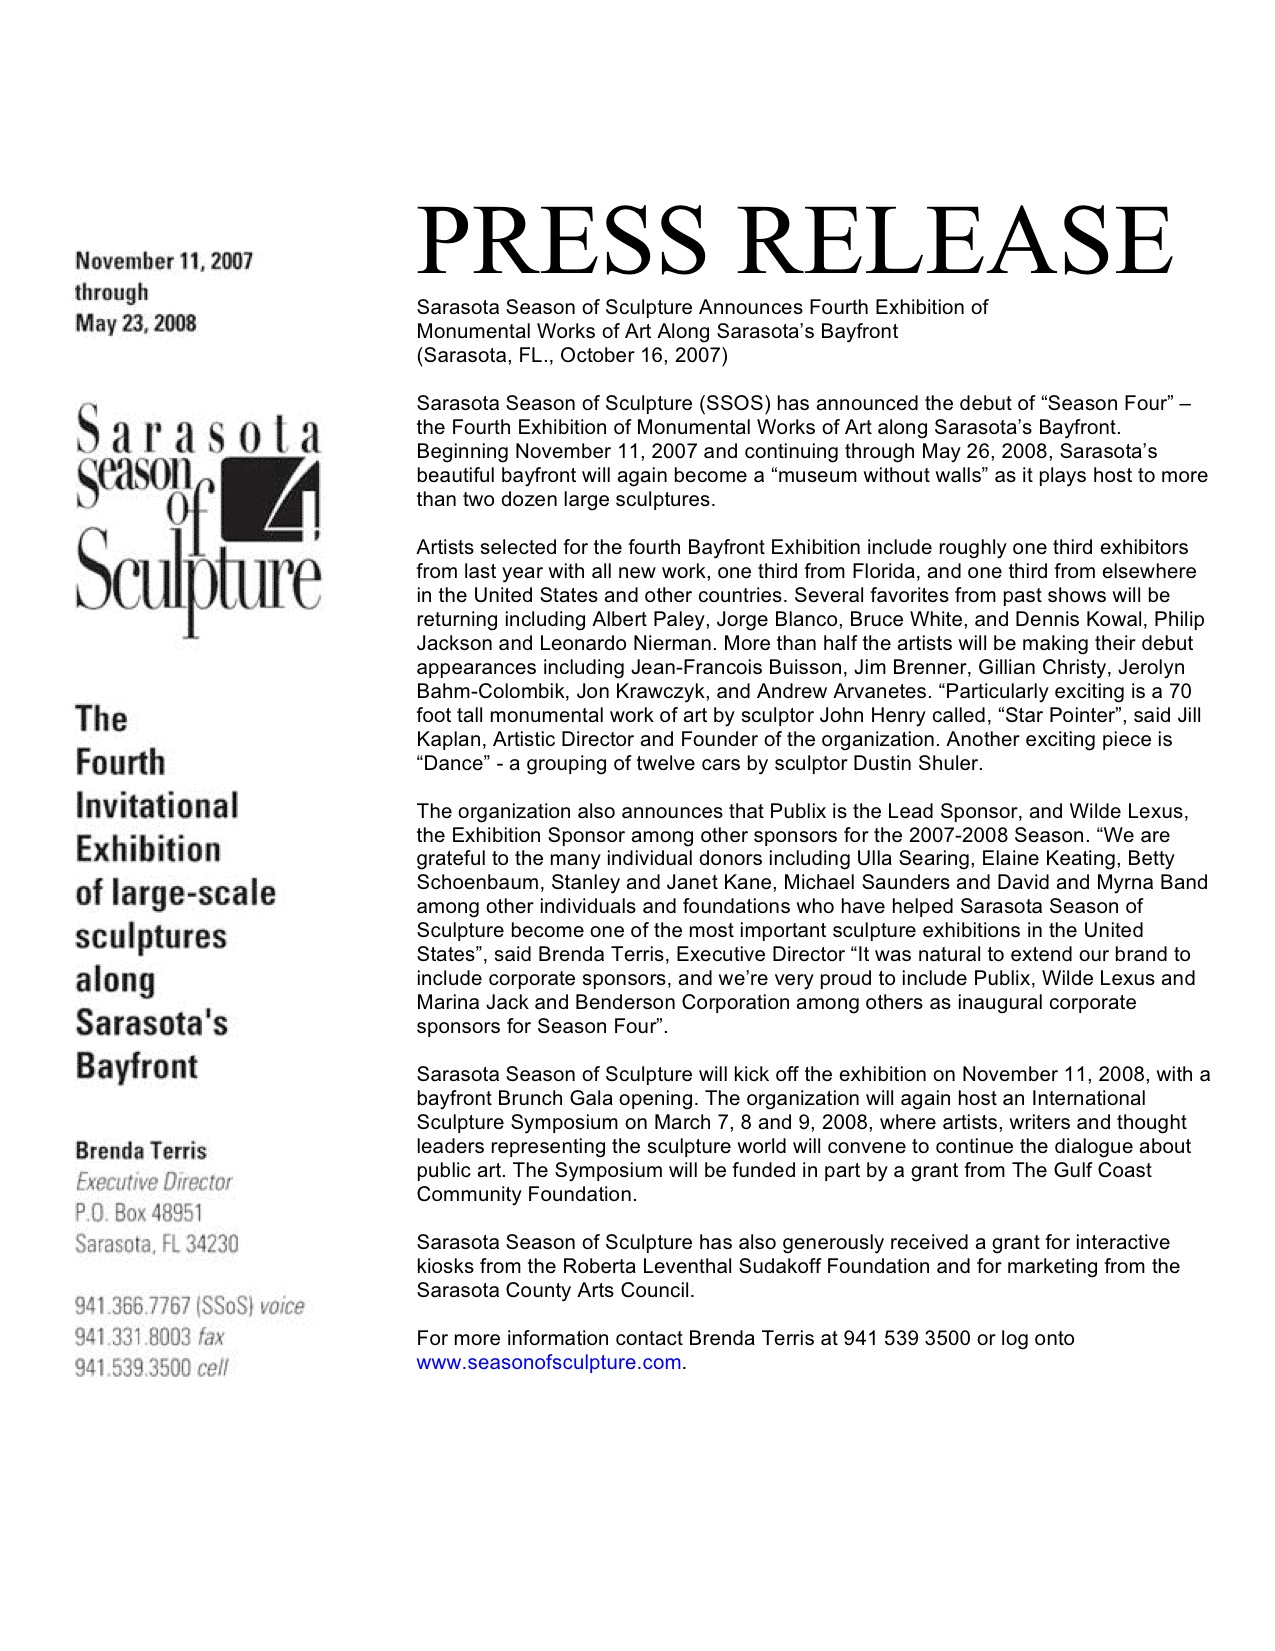 Sarasota Press Release 1.jpg